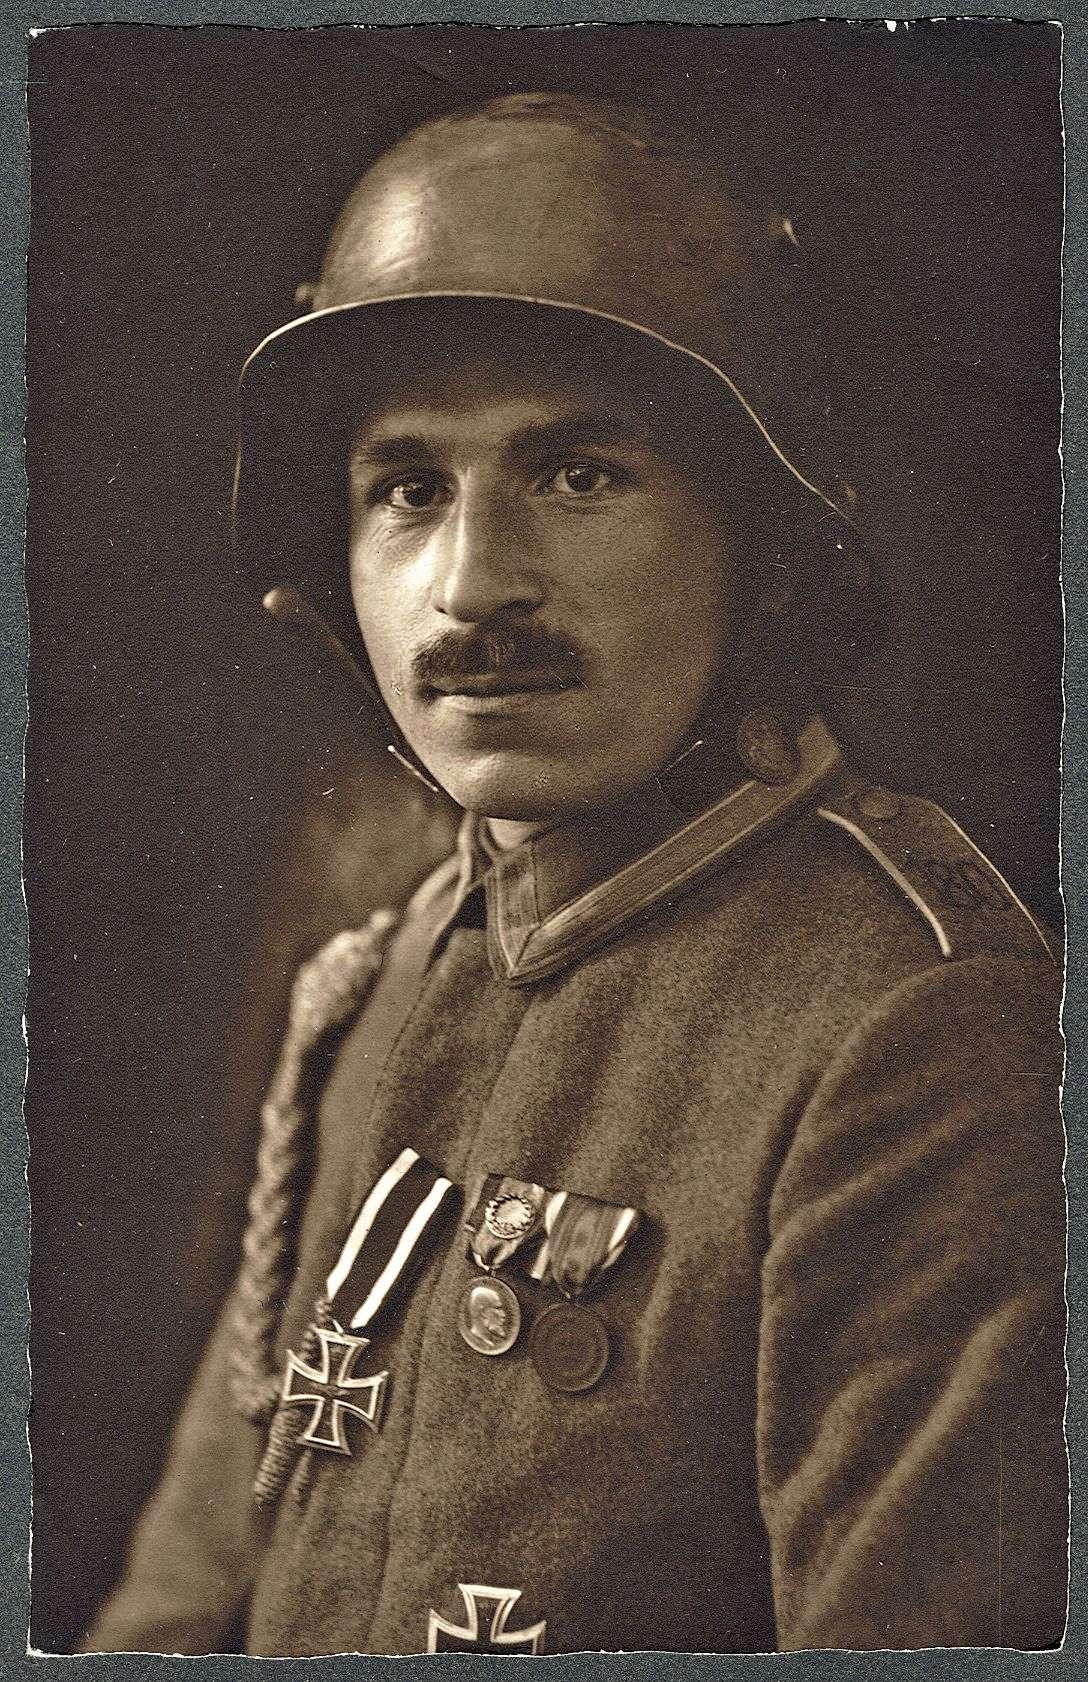 Mocker, Karl, Bild 1